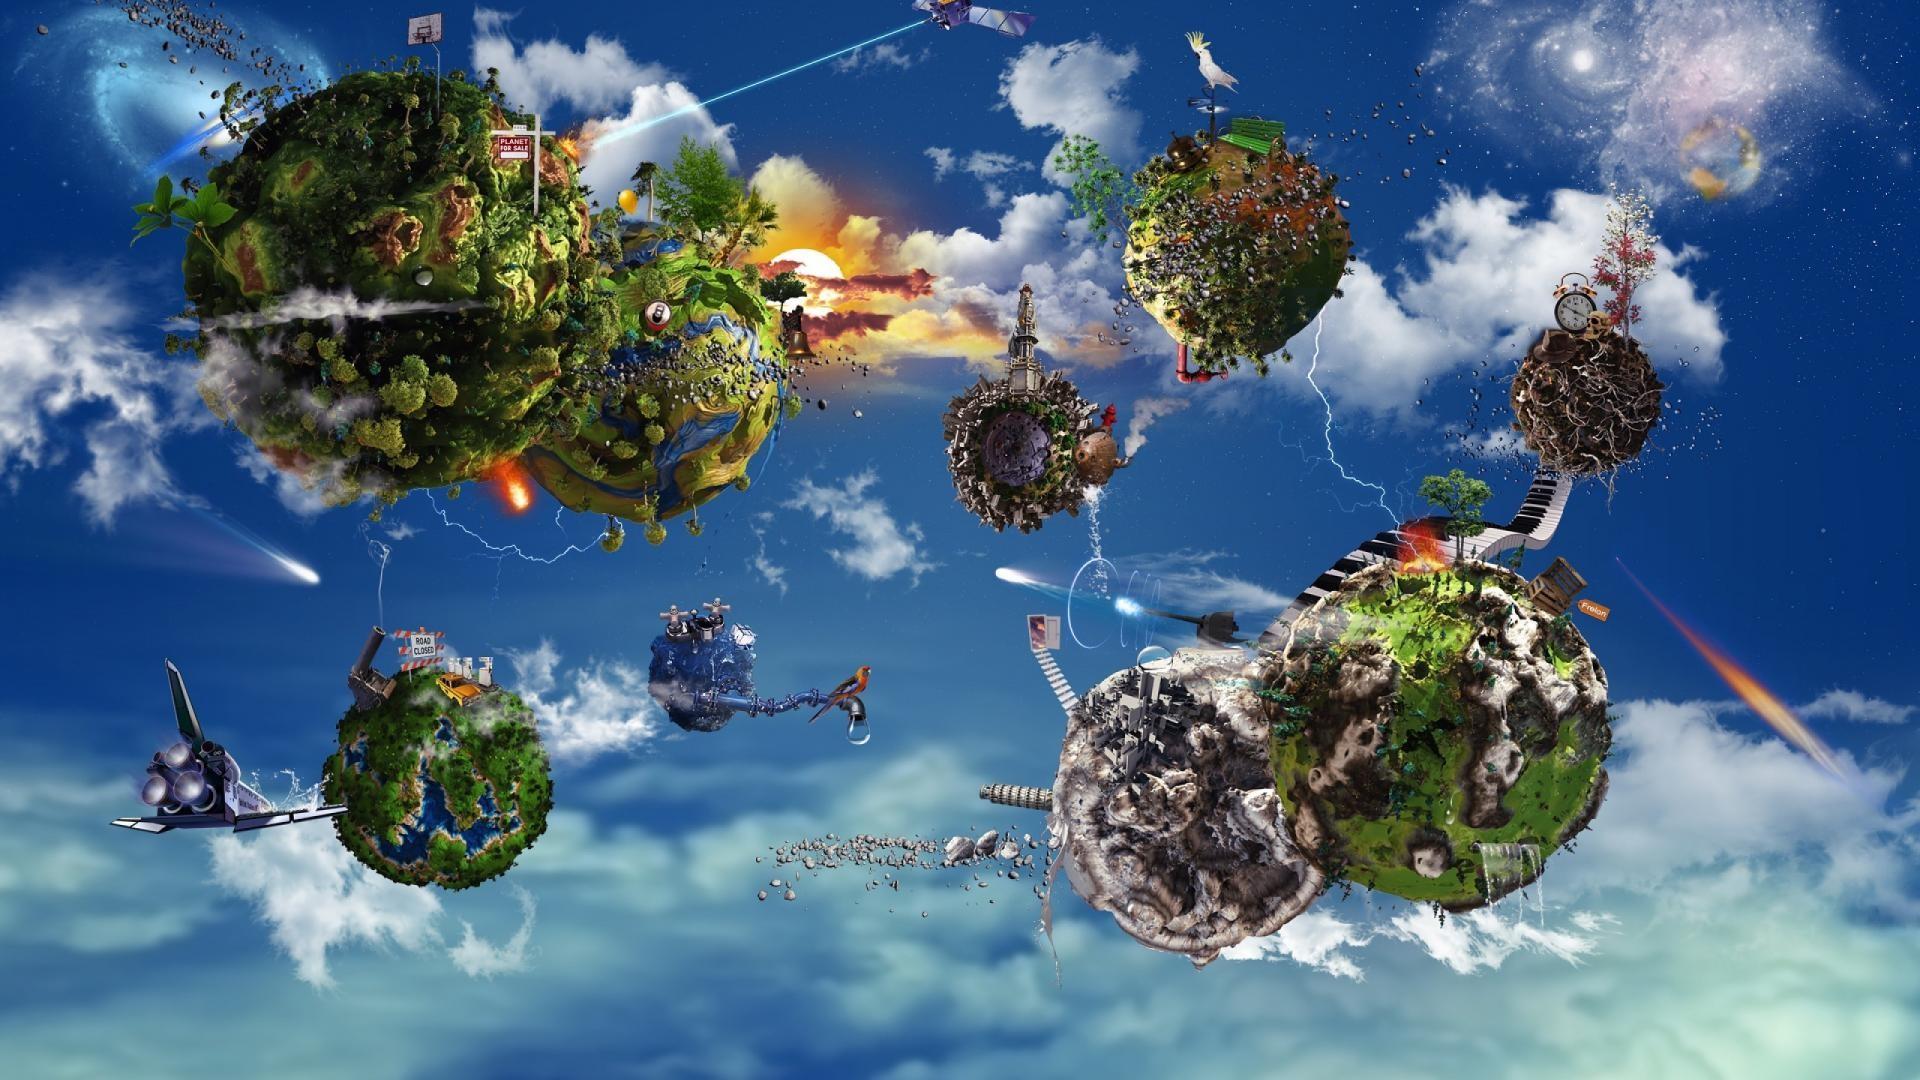 Fantasy-Planet-in-Sky-Fantasy-Wallpapers.jpg (1920×